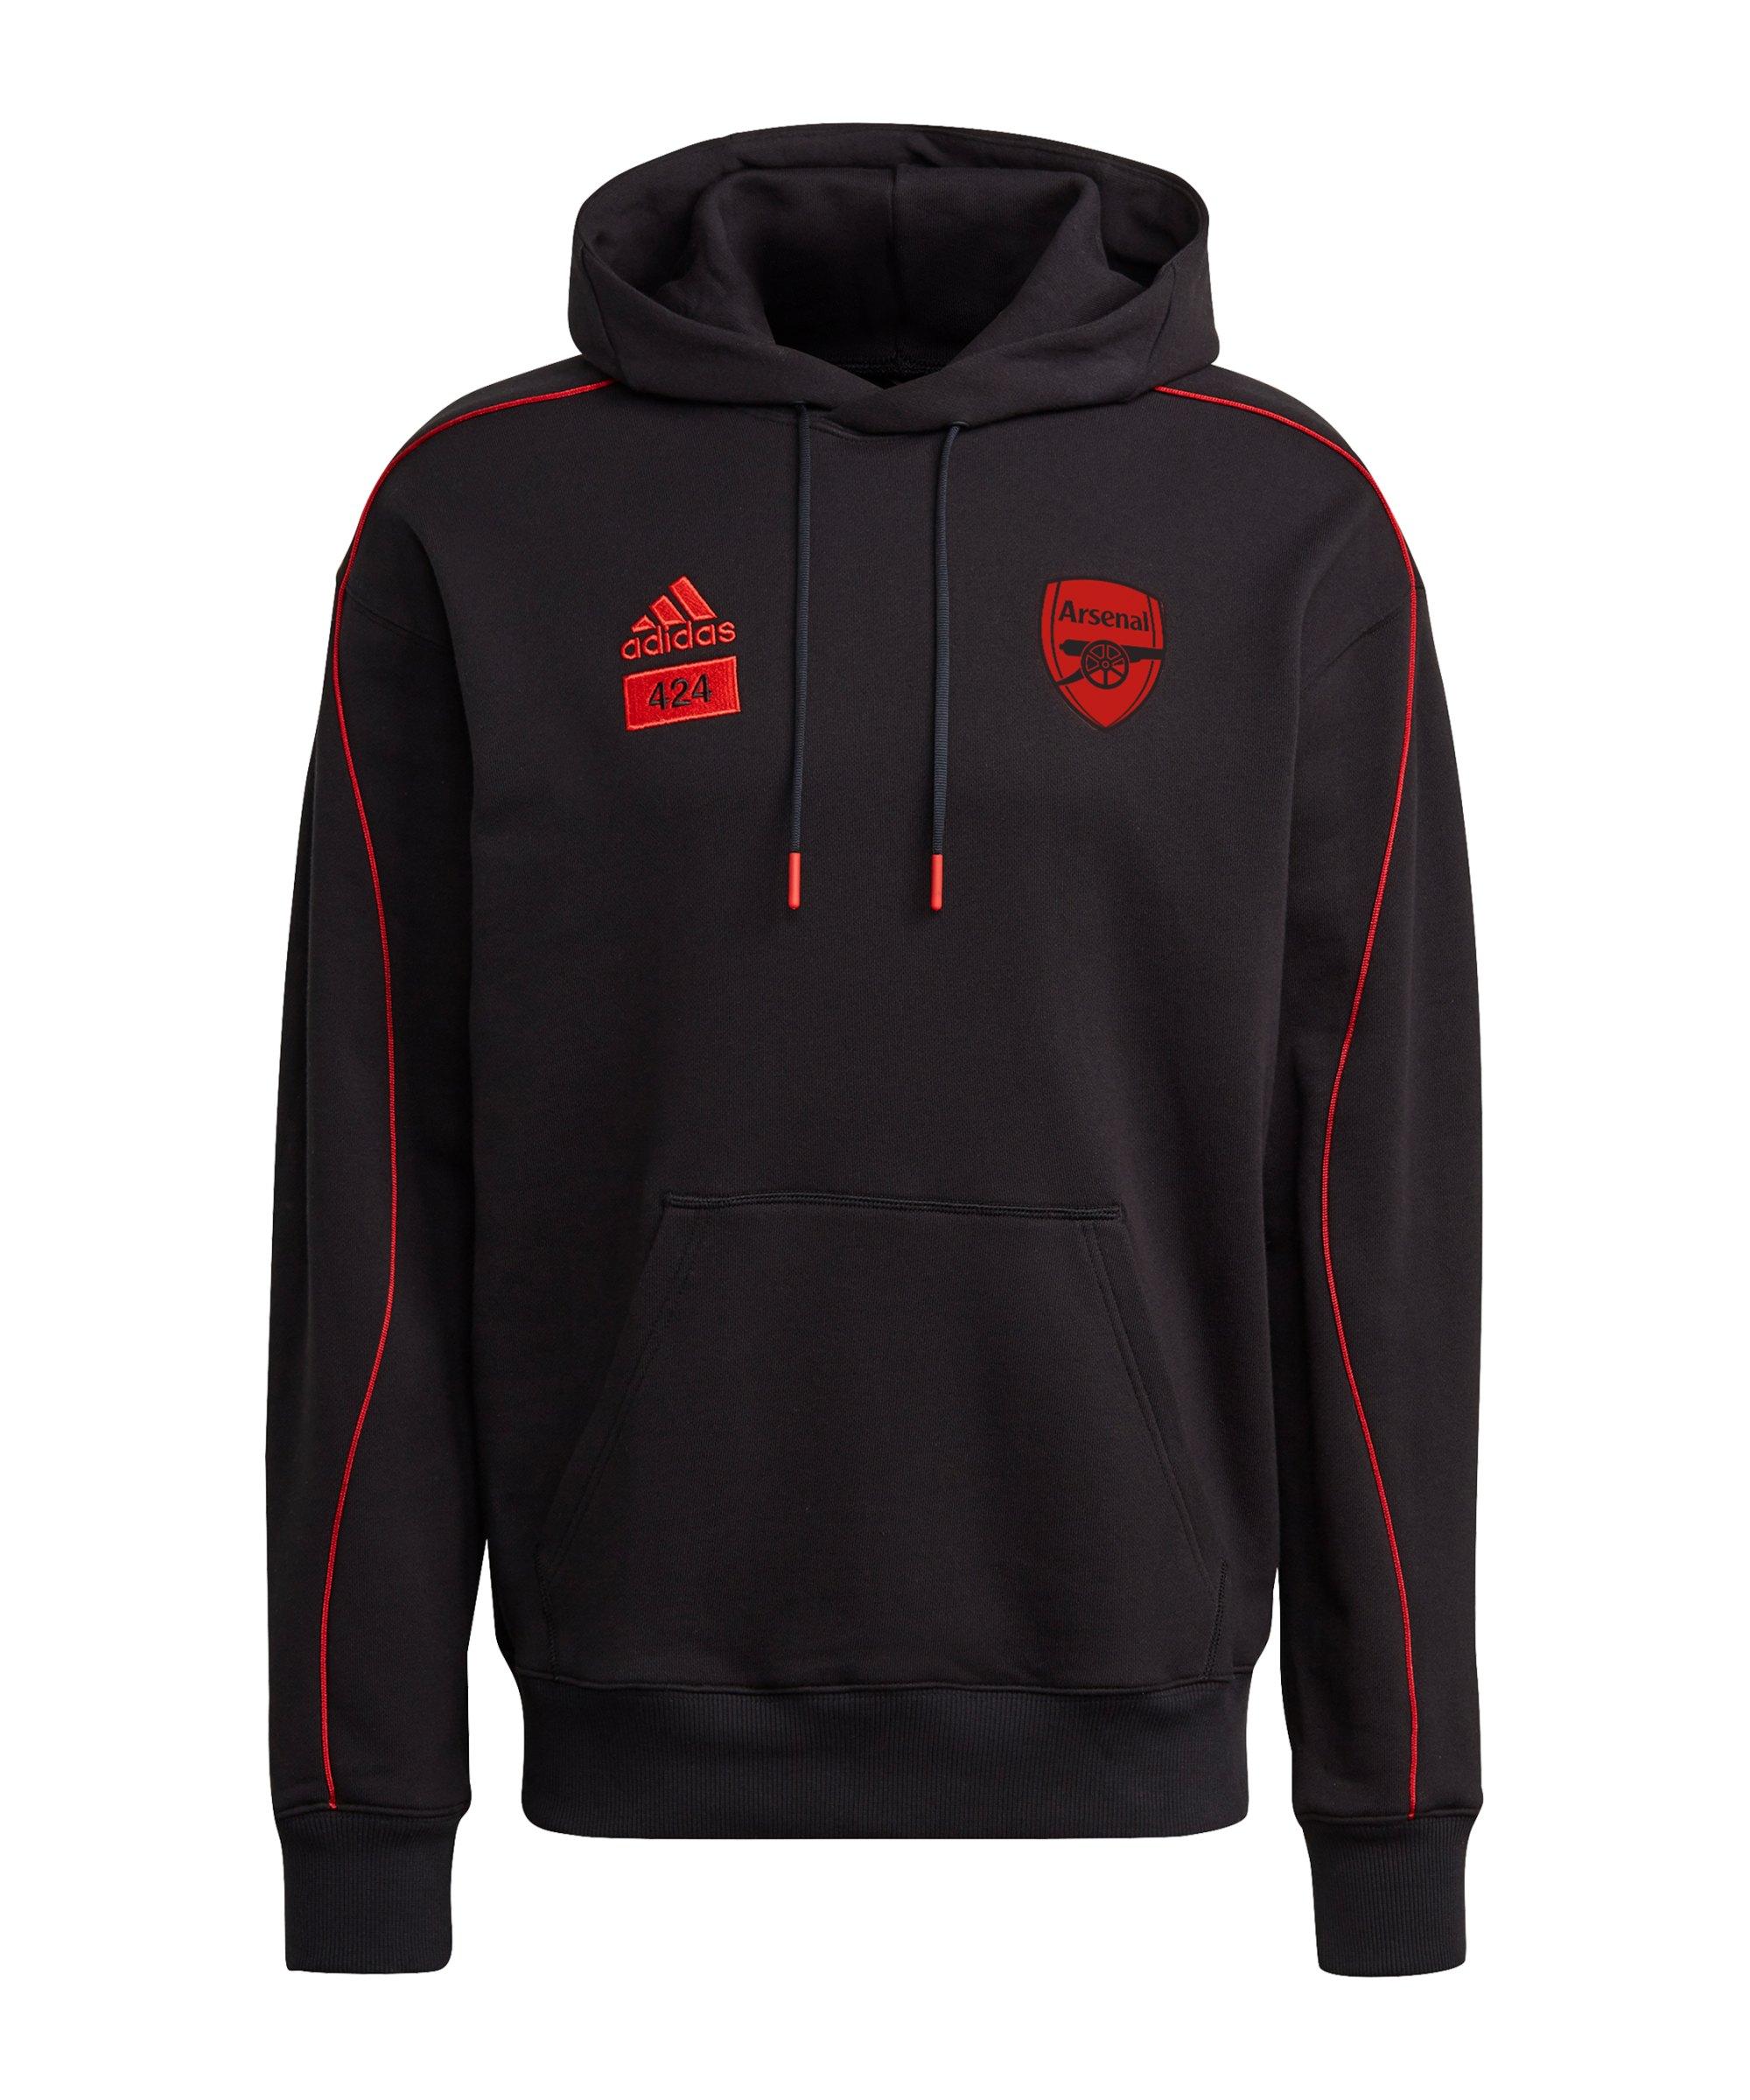 adidas FC Arsenal London x 424 Hoody Schwarz - schwarz